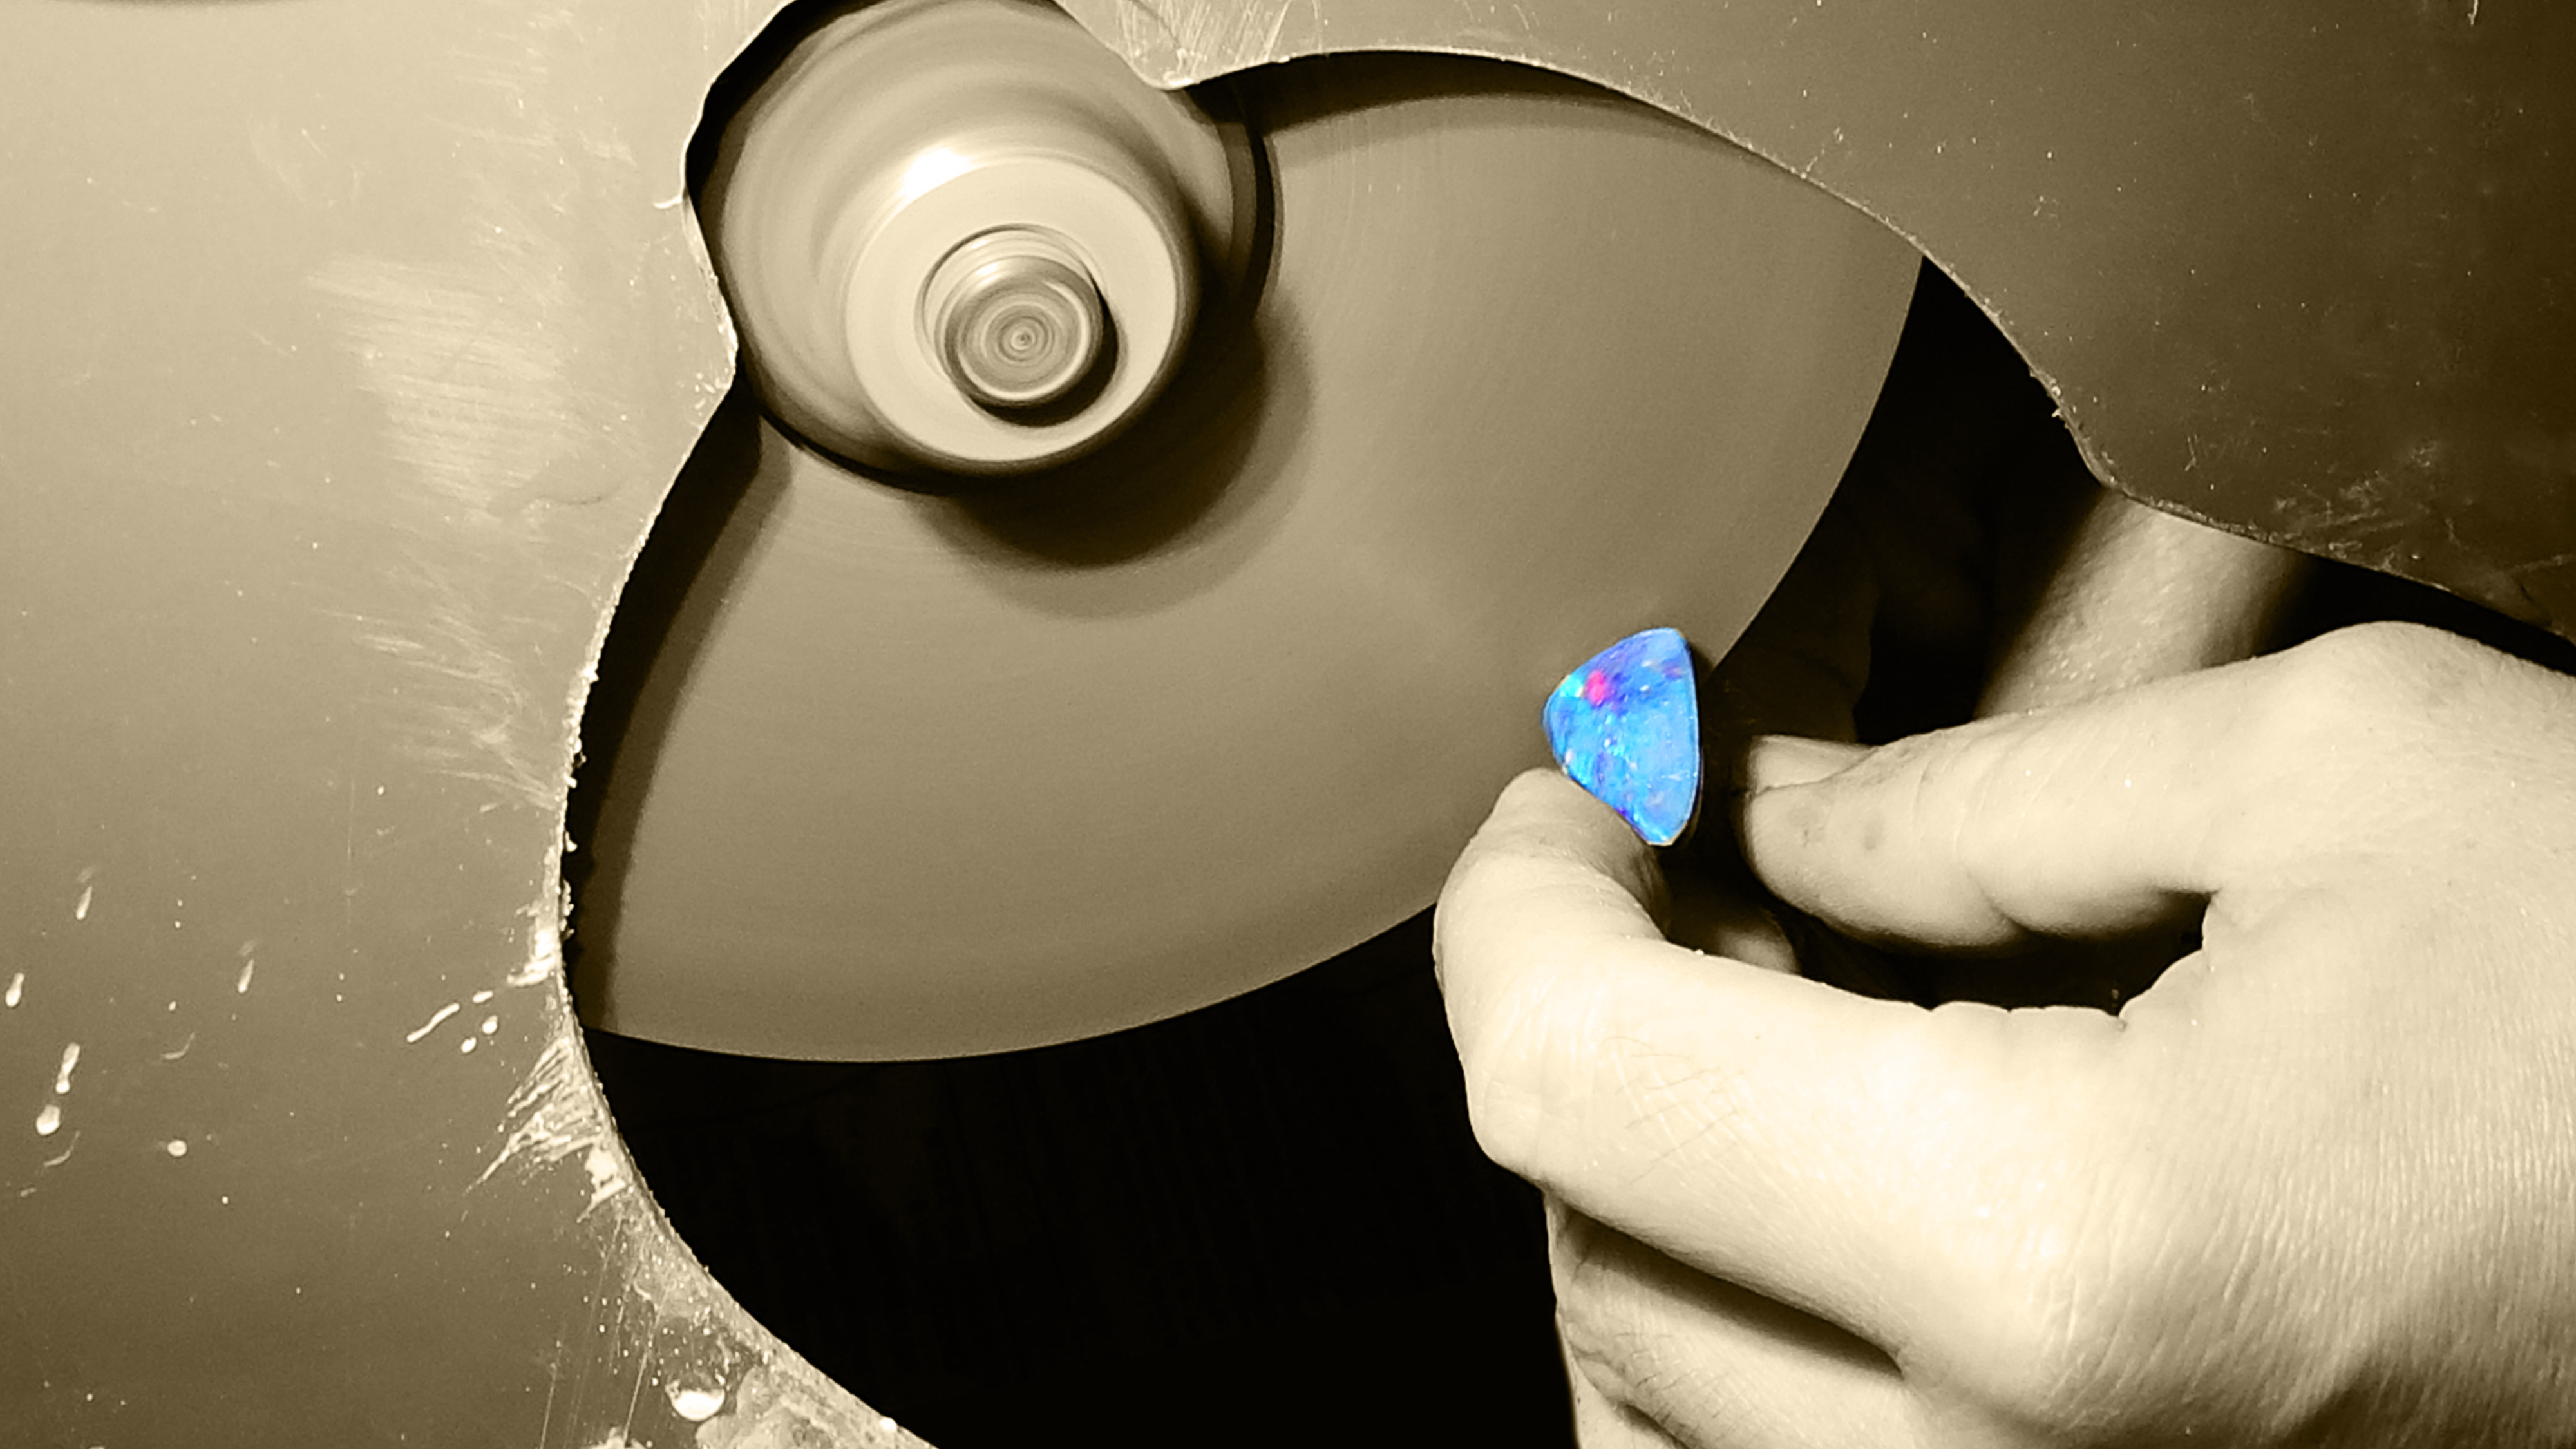 Opal manufacturing, polishing